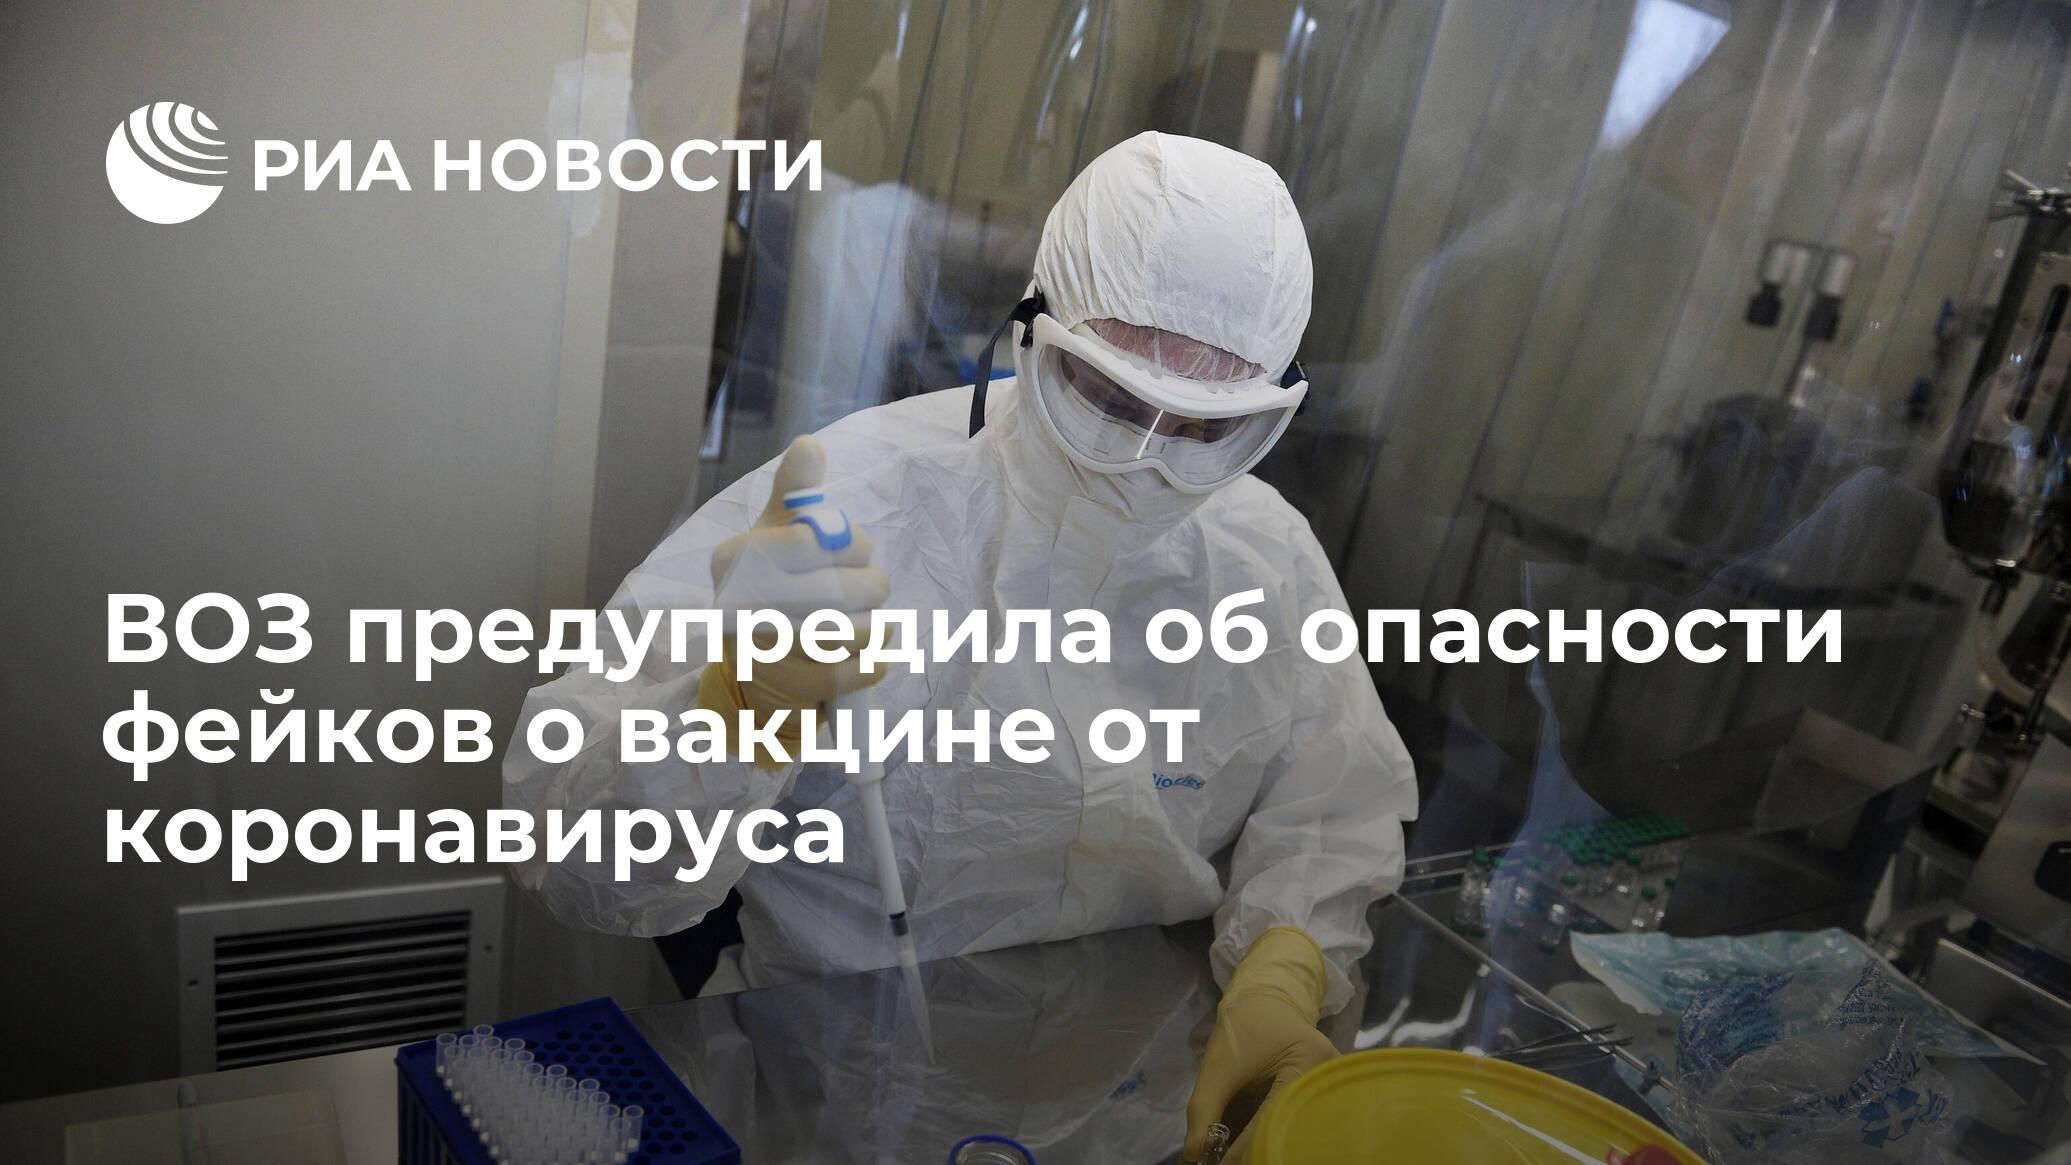 ВОЗ предупредила об опасности фейков о вакцине от коронавируса